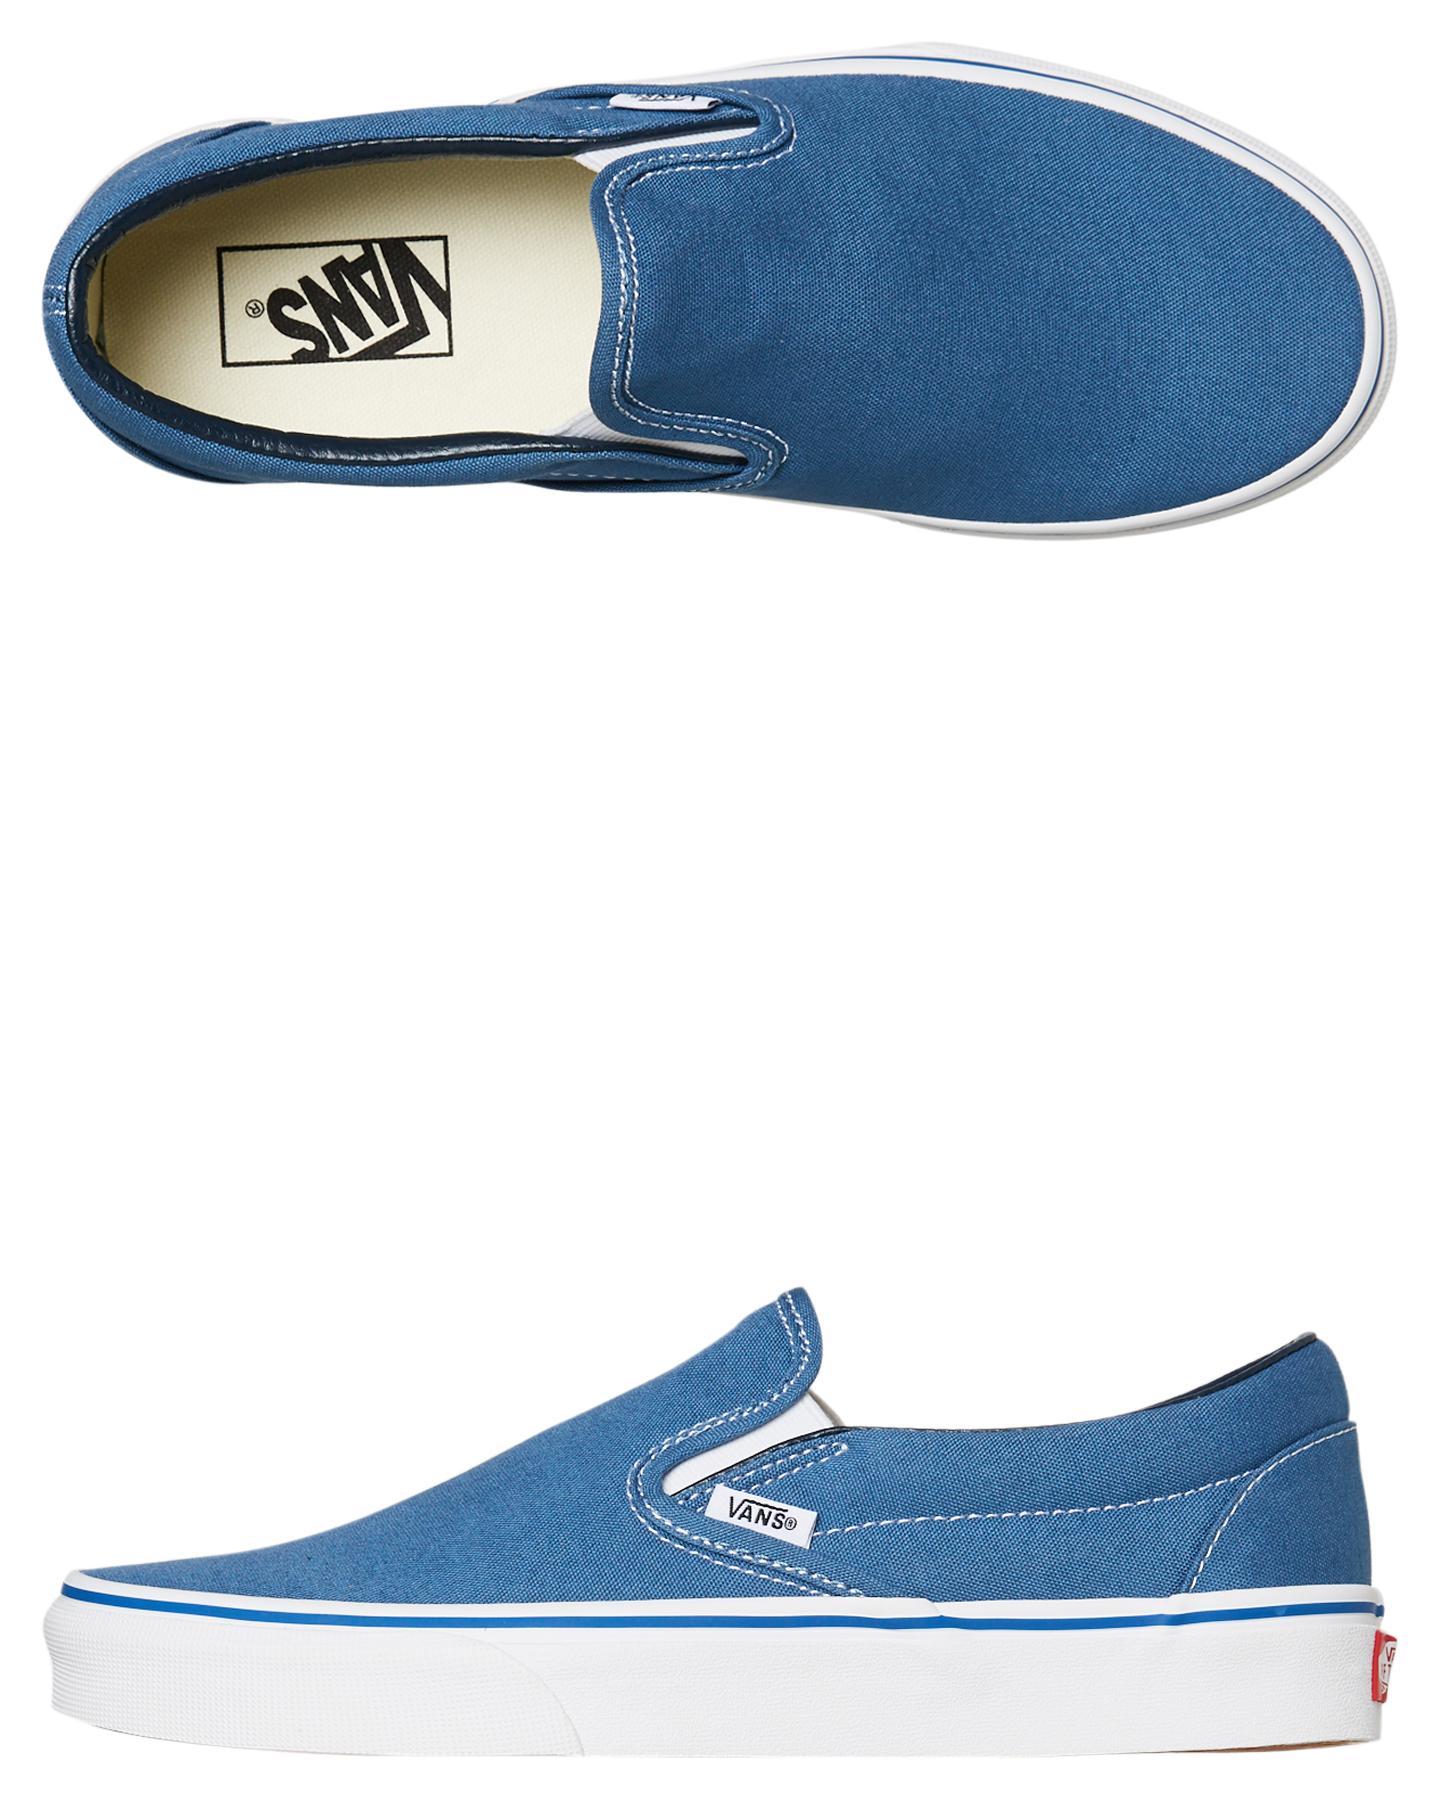 a6f1f07cb2aea1 Vans Womens Classic Slip On Shoe - Navy